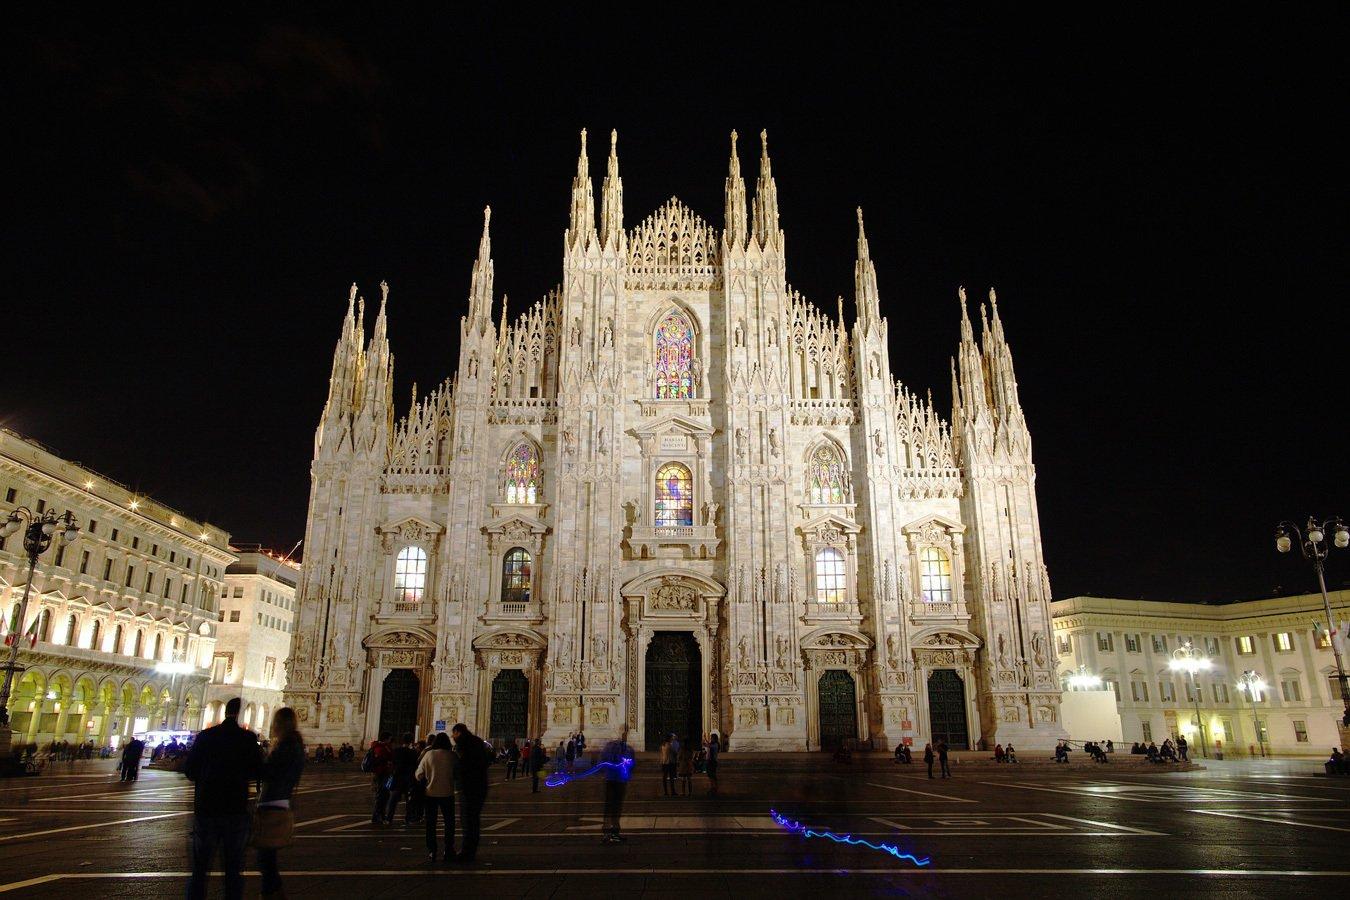 Italy tours brings you to big beautiful church